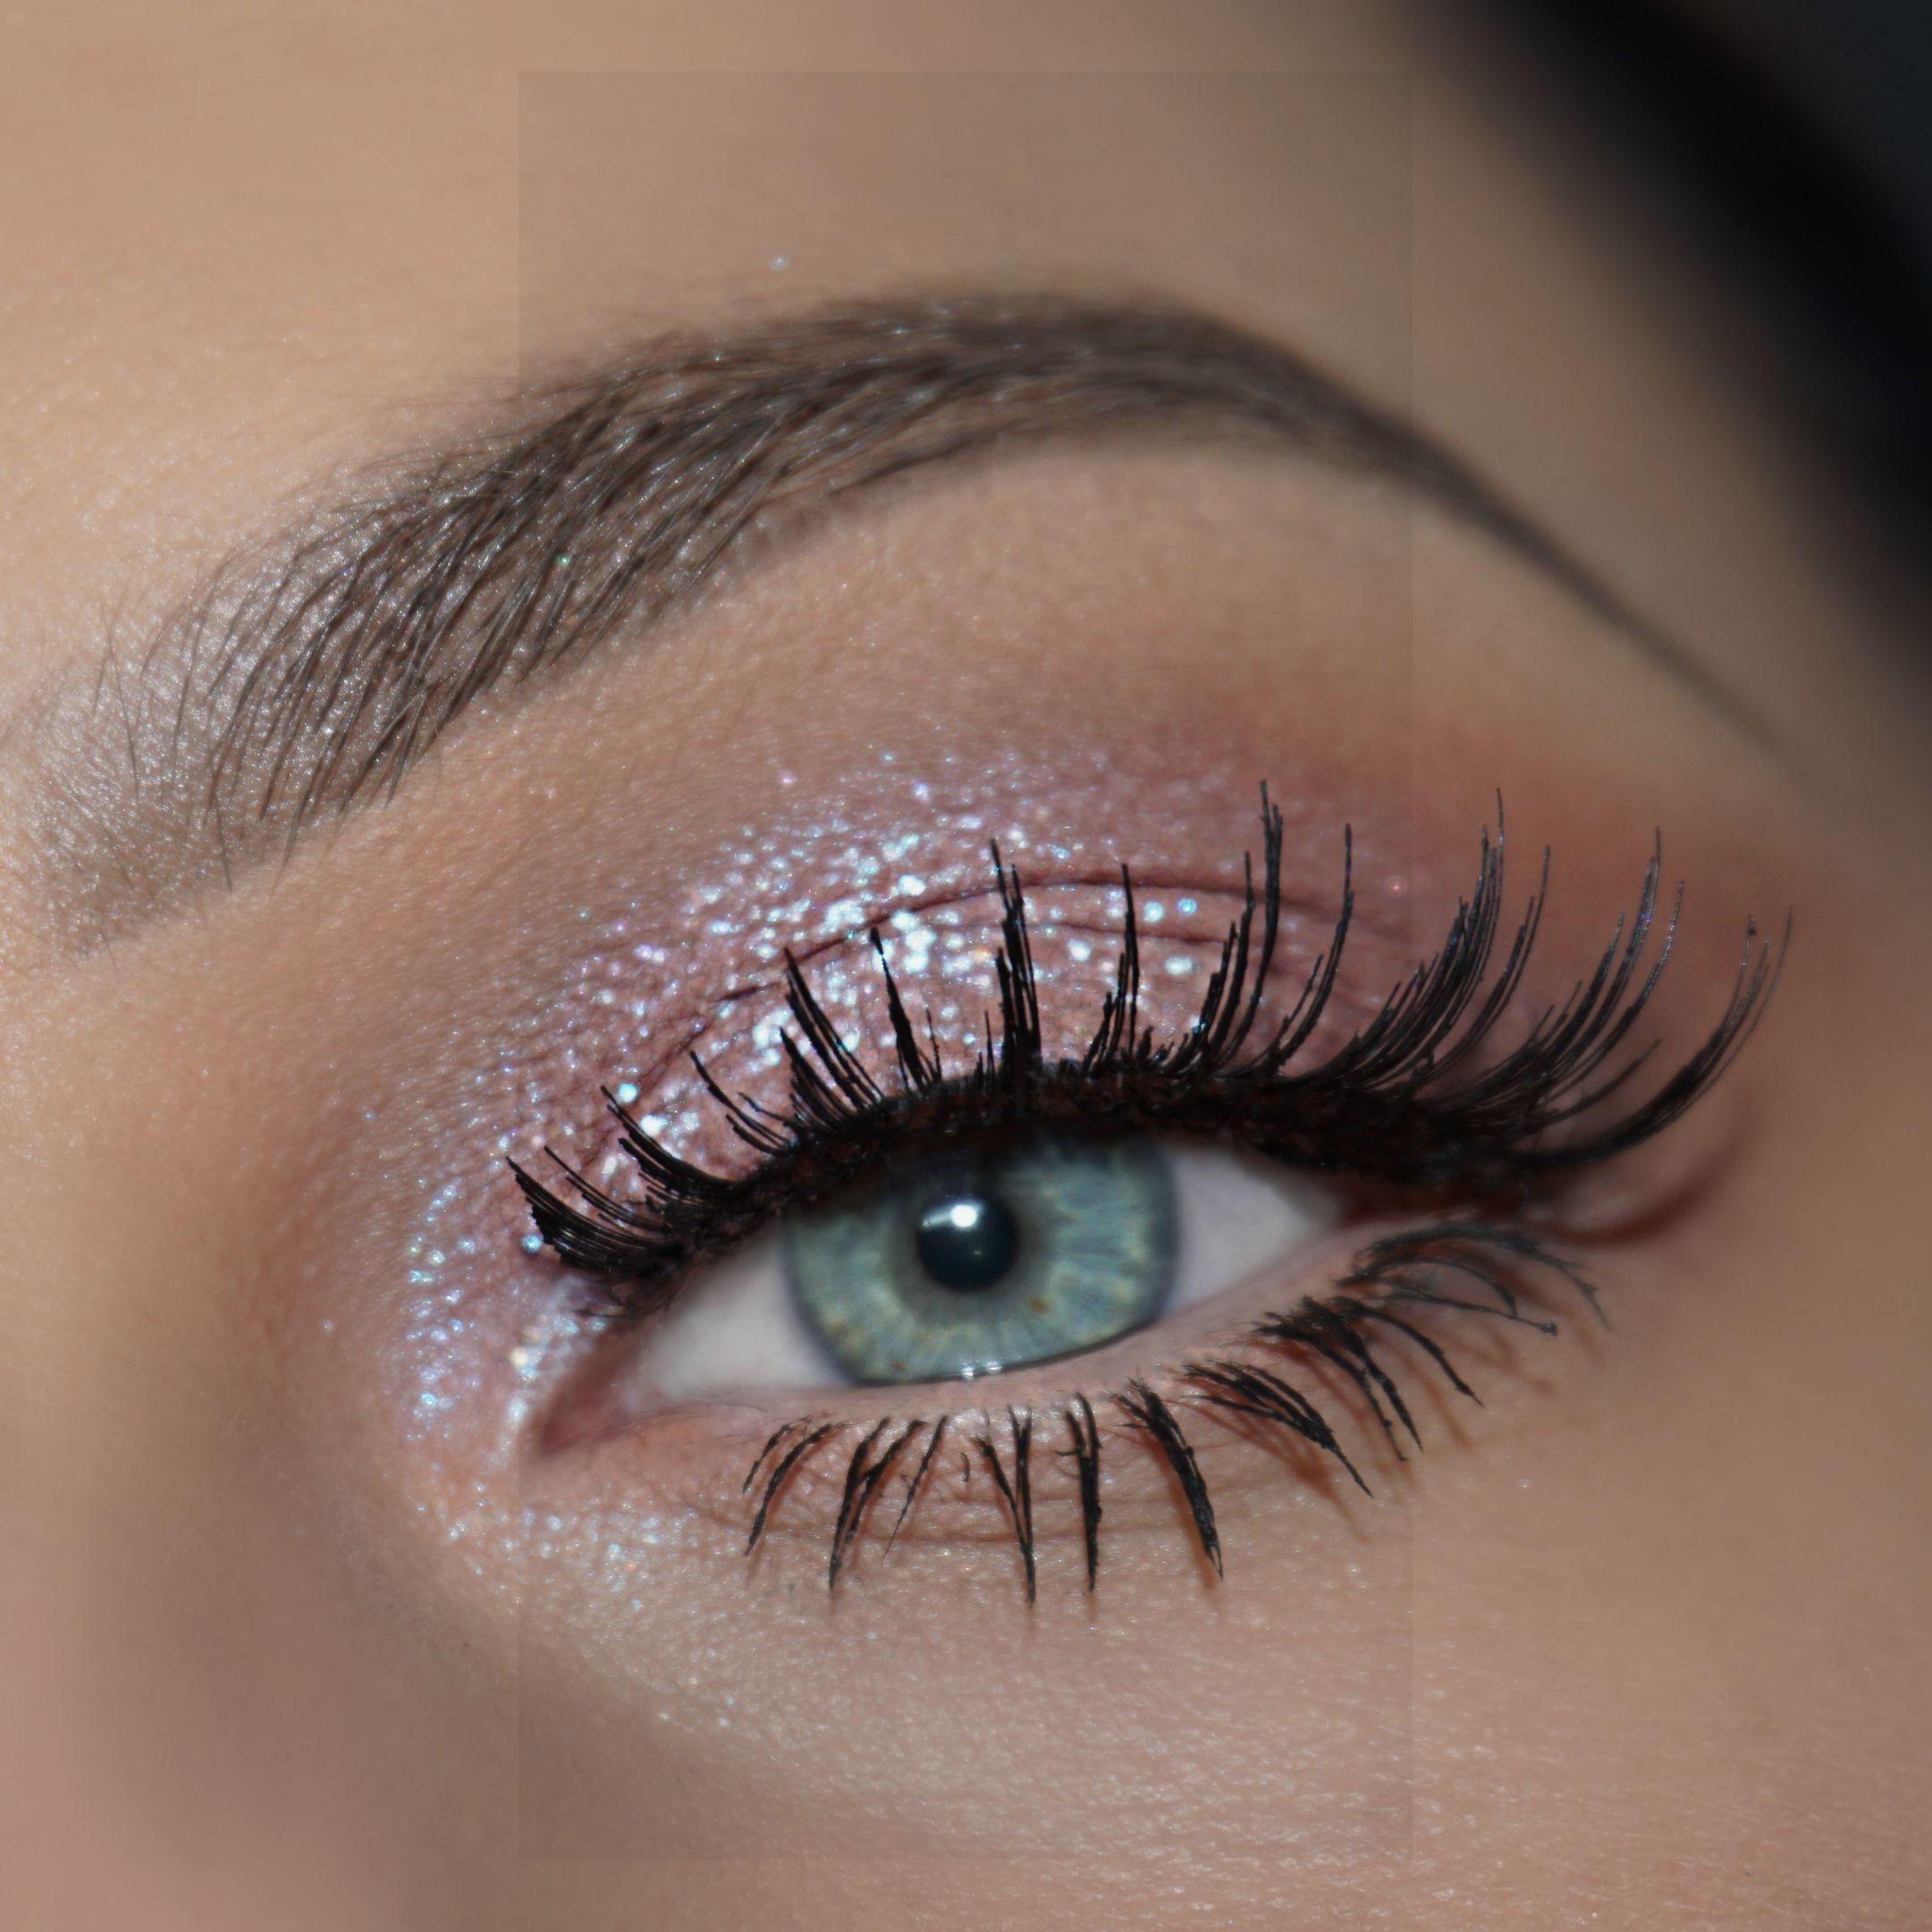 "Obtenga el Look with Motives®: Tutorial de maquillaje ""Starshine"" #eye #eyemakeup #Makeup …, #EYE #ey …"